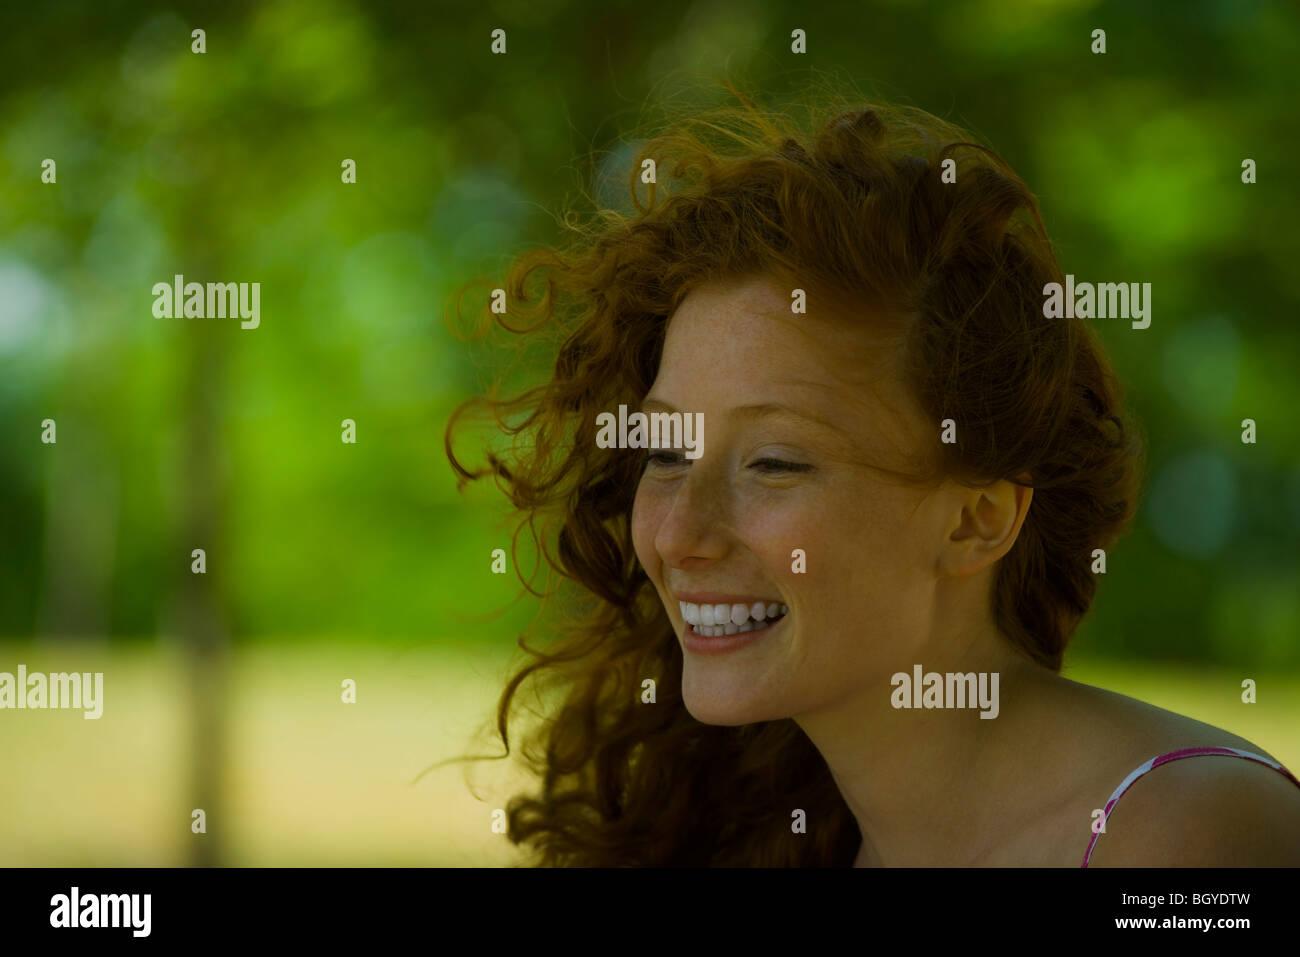 Junge Frau, Lächeln, Porträt Stockfoto